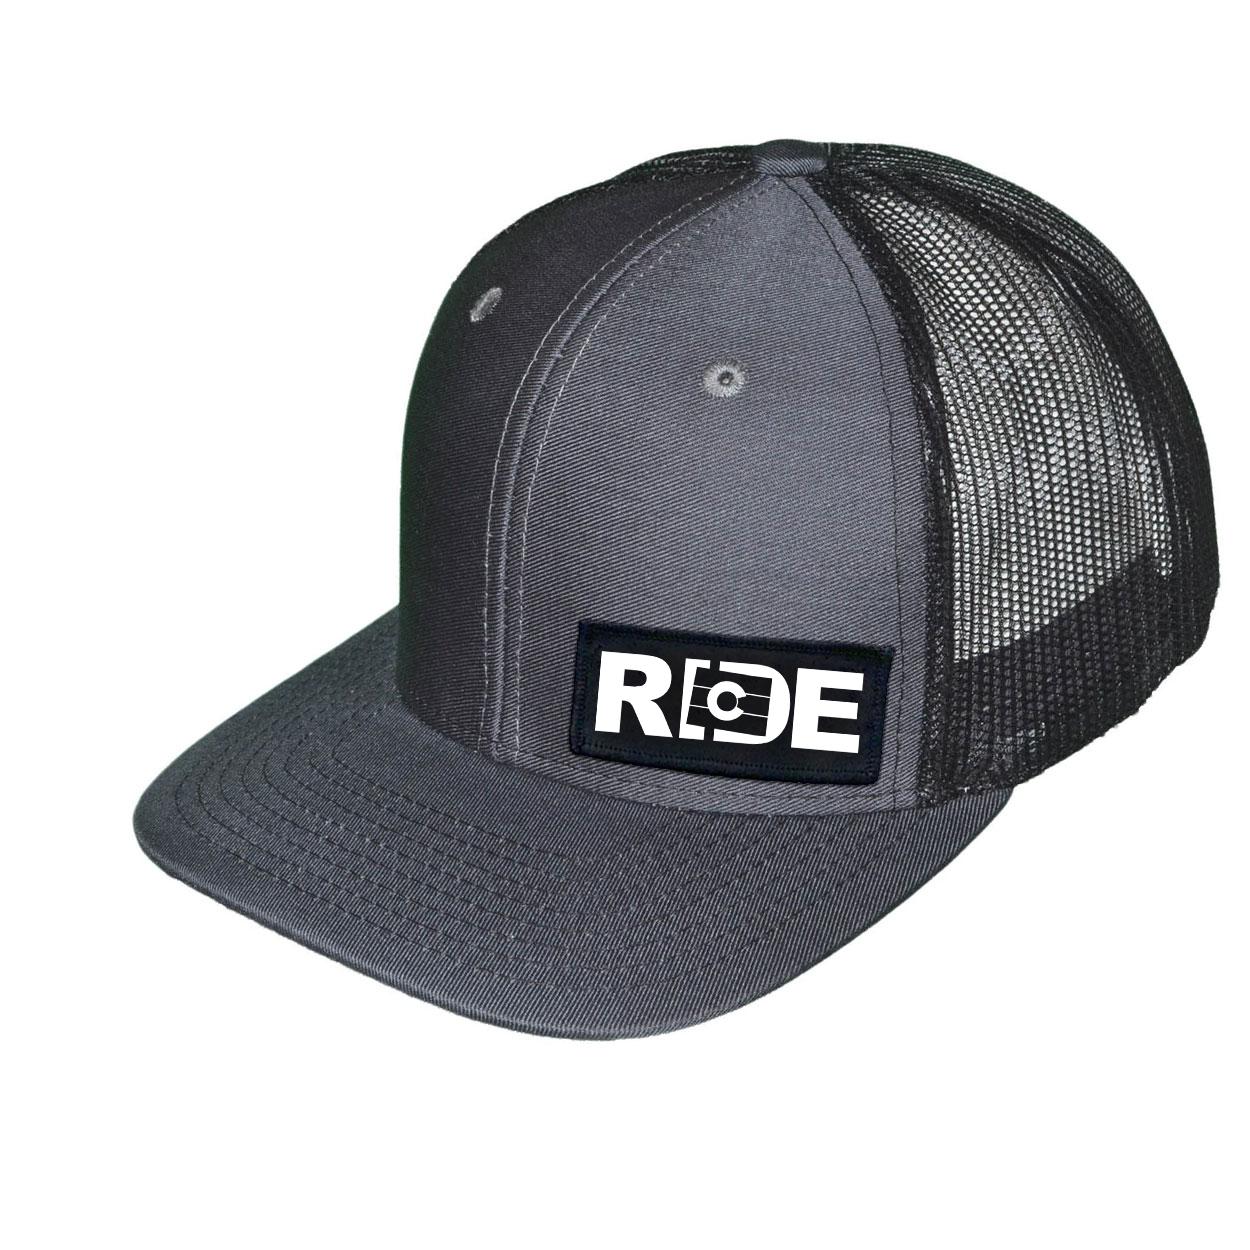 Ride Colorado Night Out Woven Patch Snapback Trucker Hat Dark Gray/Black (White Logo)